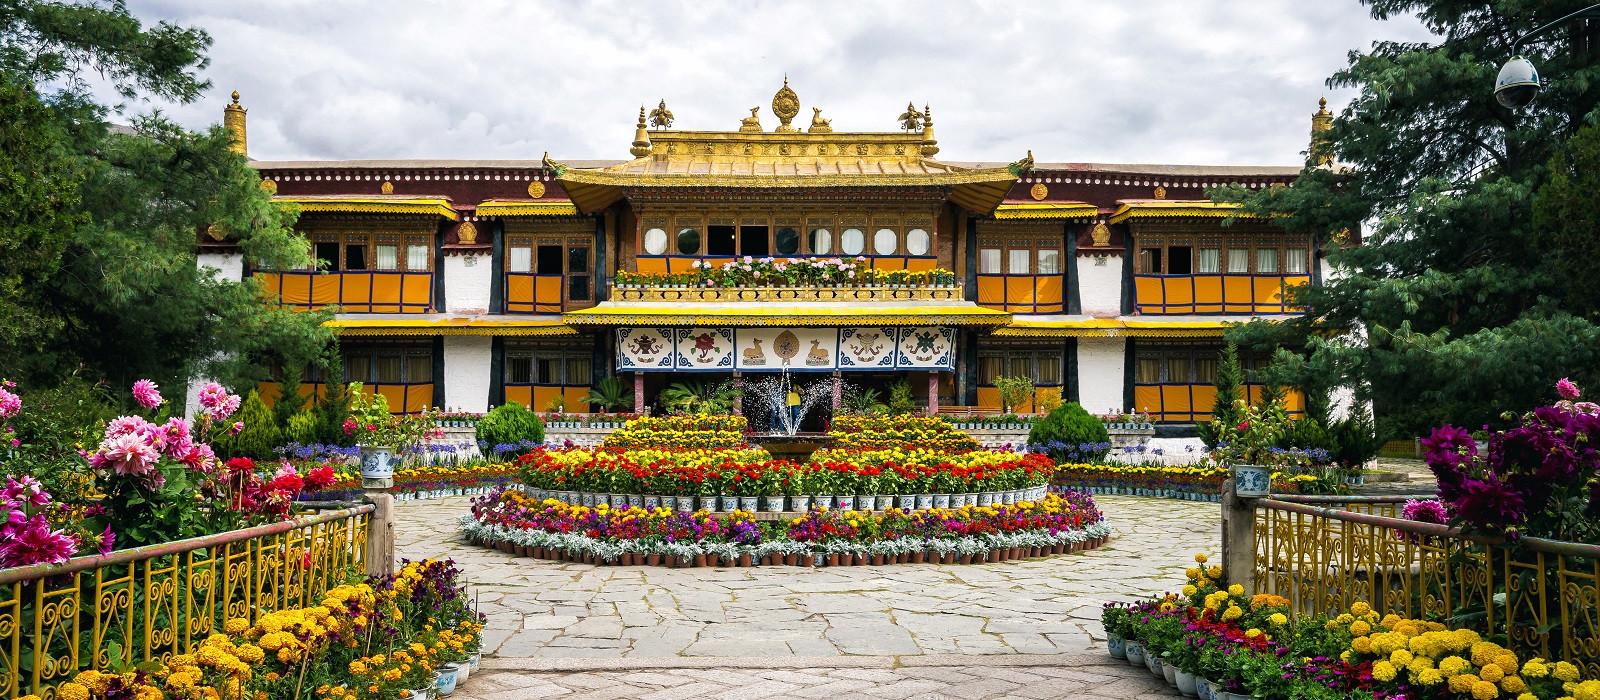 Reiseziel Lhasa Tibet